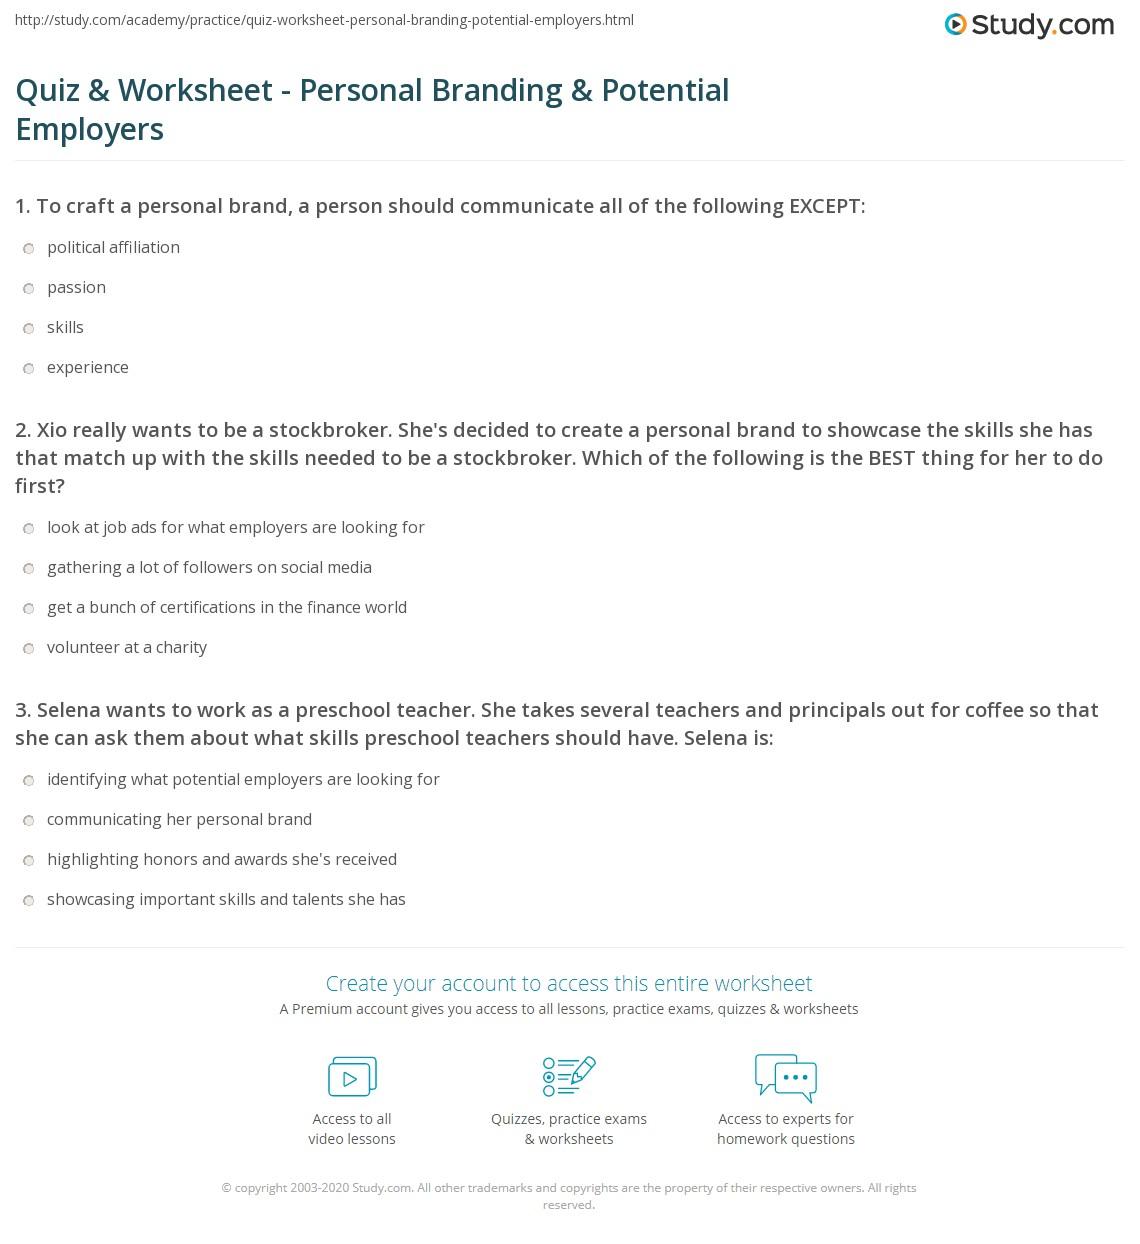 Personal Branding Worksheet Printable Worksheets And Activities For Teachers Parents Tutors And Homeschool Families